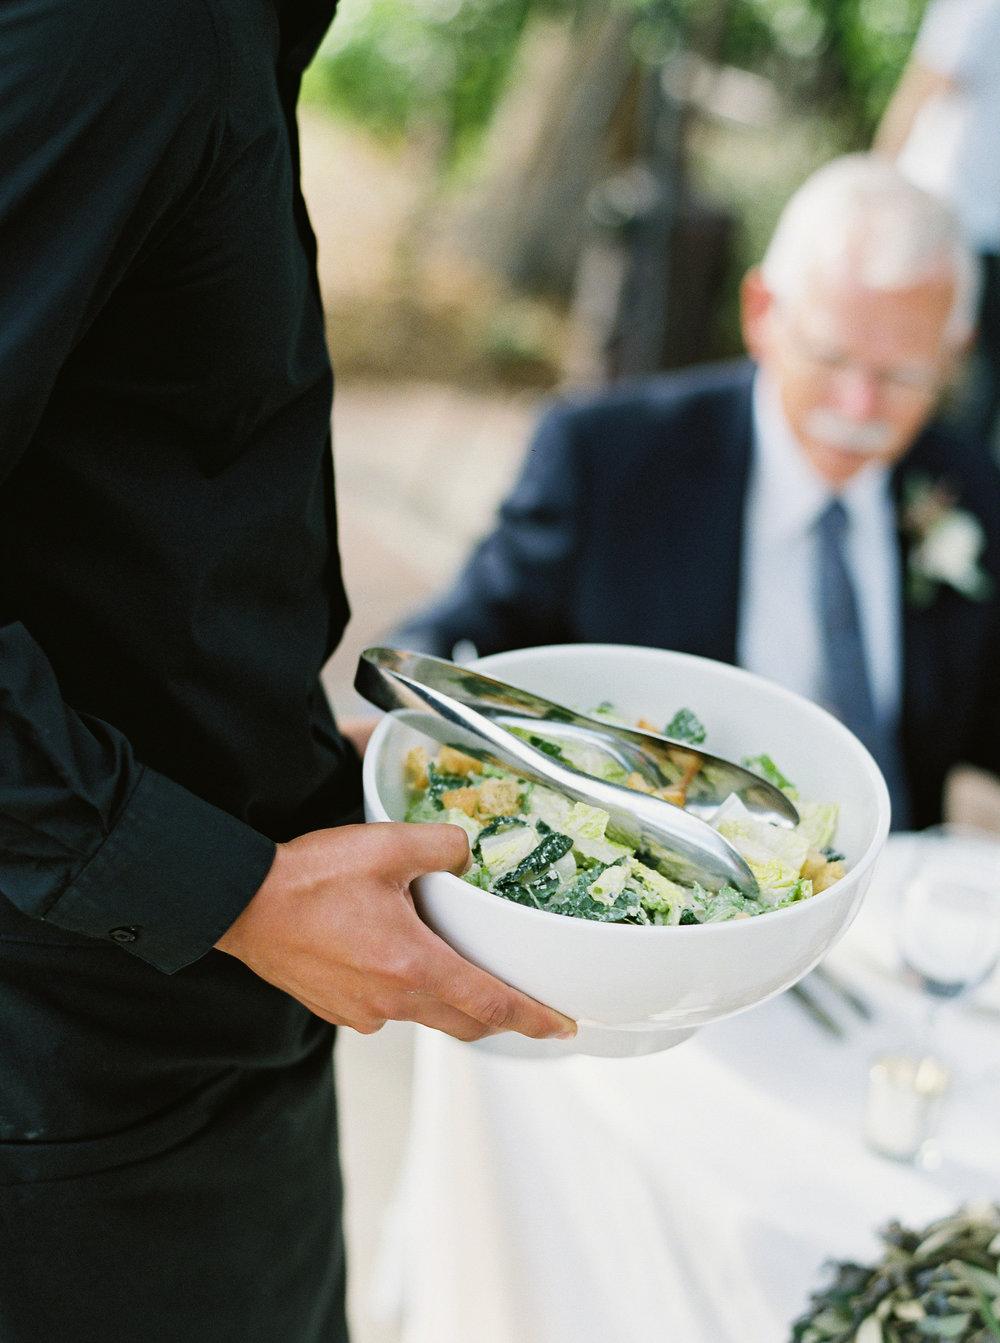 Harvest-inn-wedding-in-napa-california-61.jpg